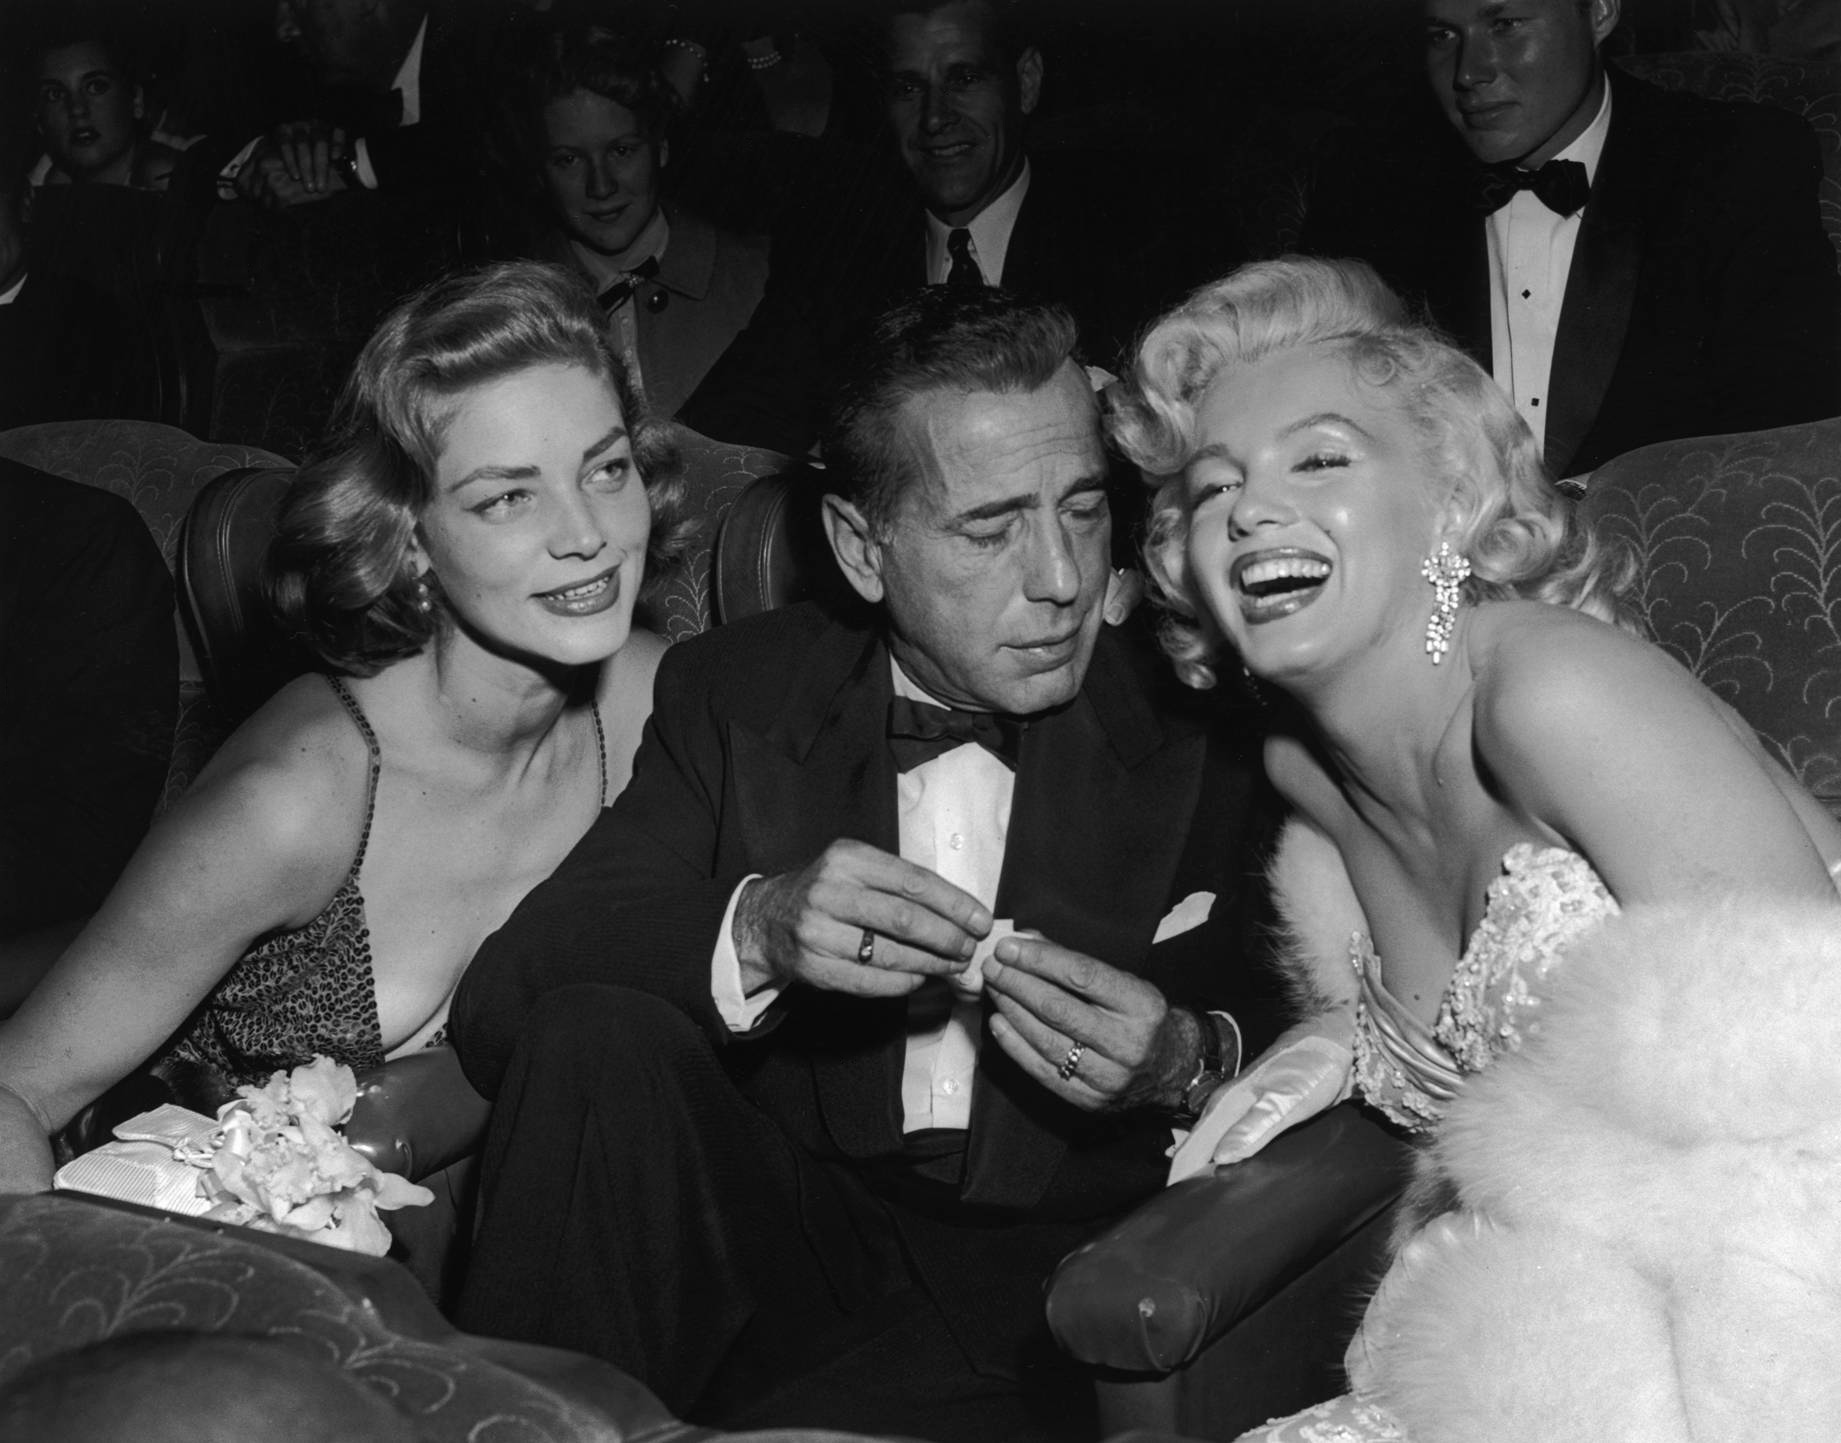 (L to R) Lauren Bacall, Humphrey Bogart, Marilyn Monroe